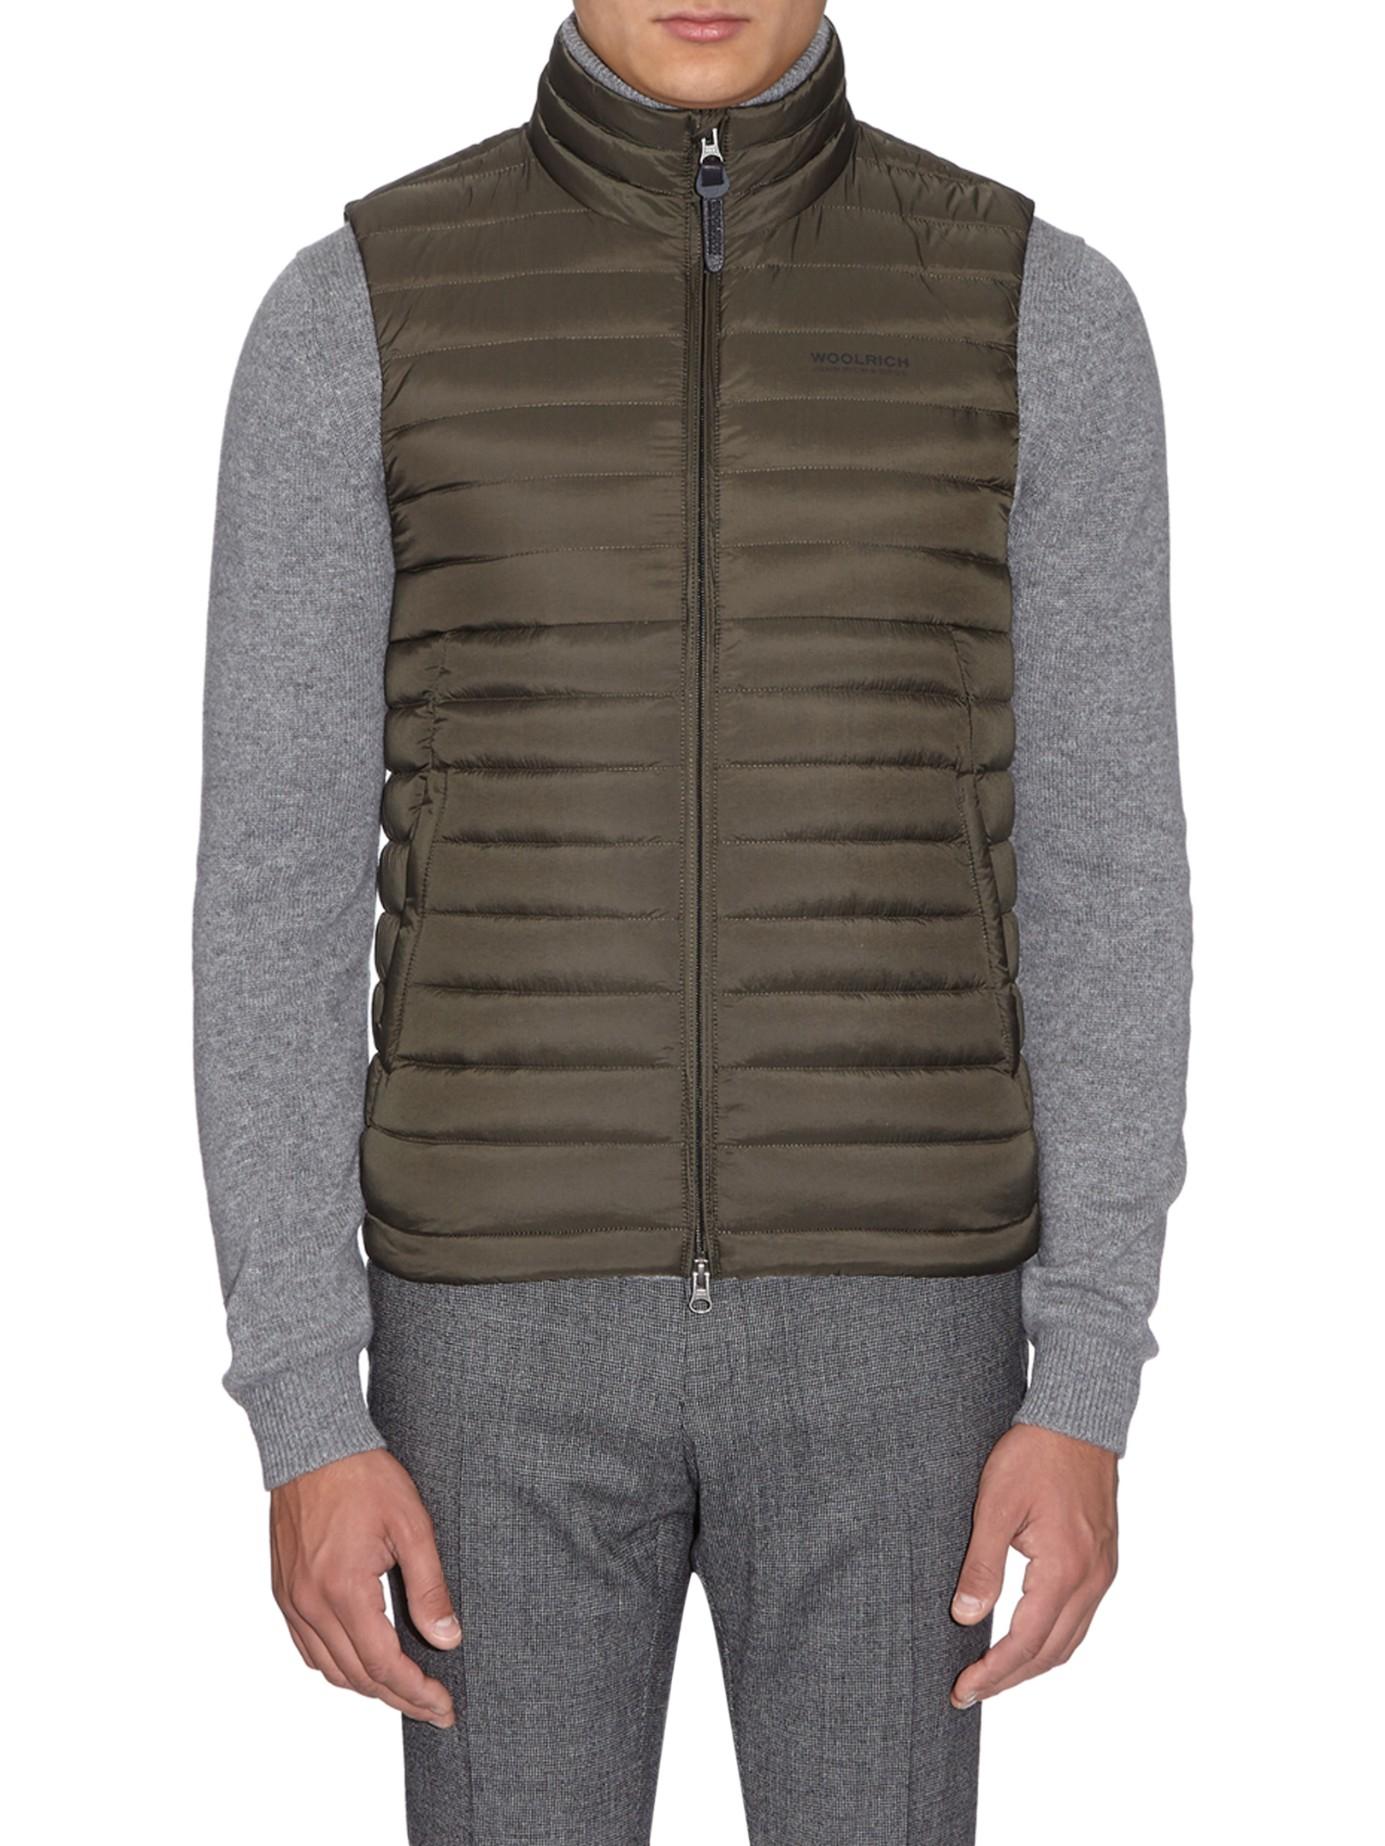 Woolrich Green Vest